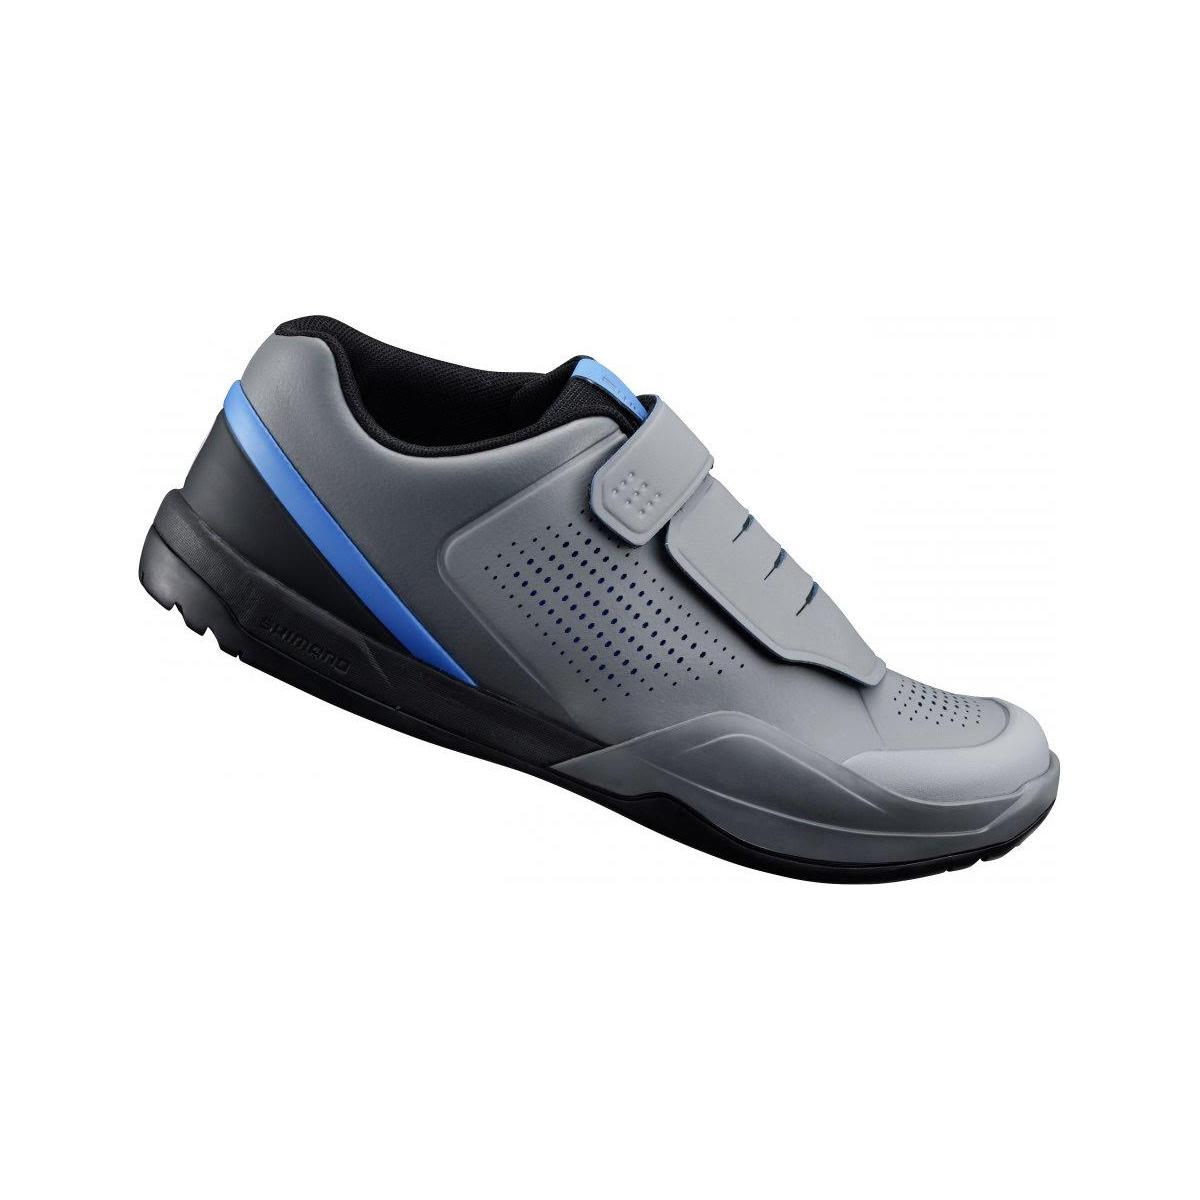 Shimano (AM9) MTB Shoe